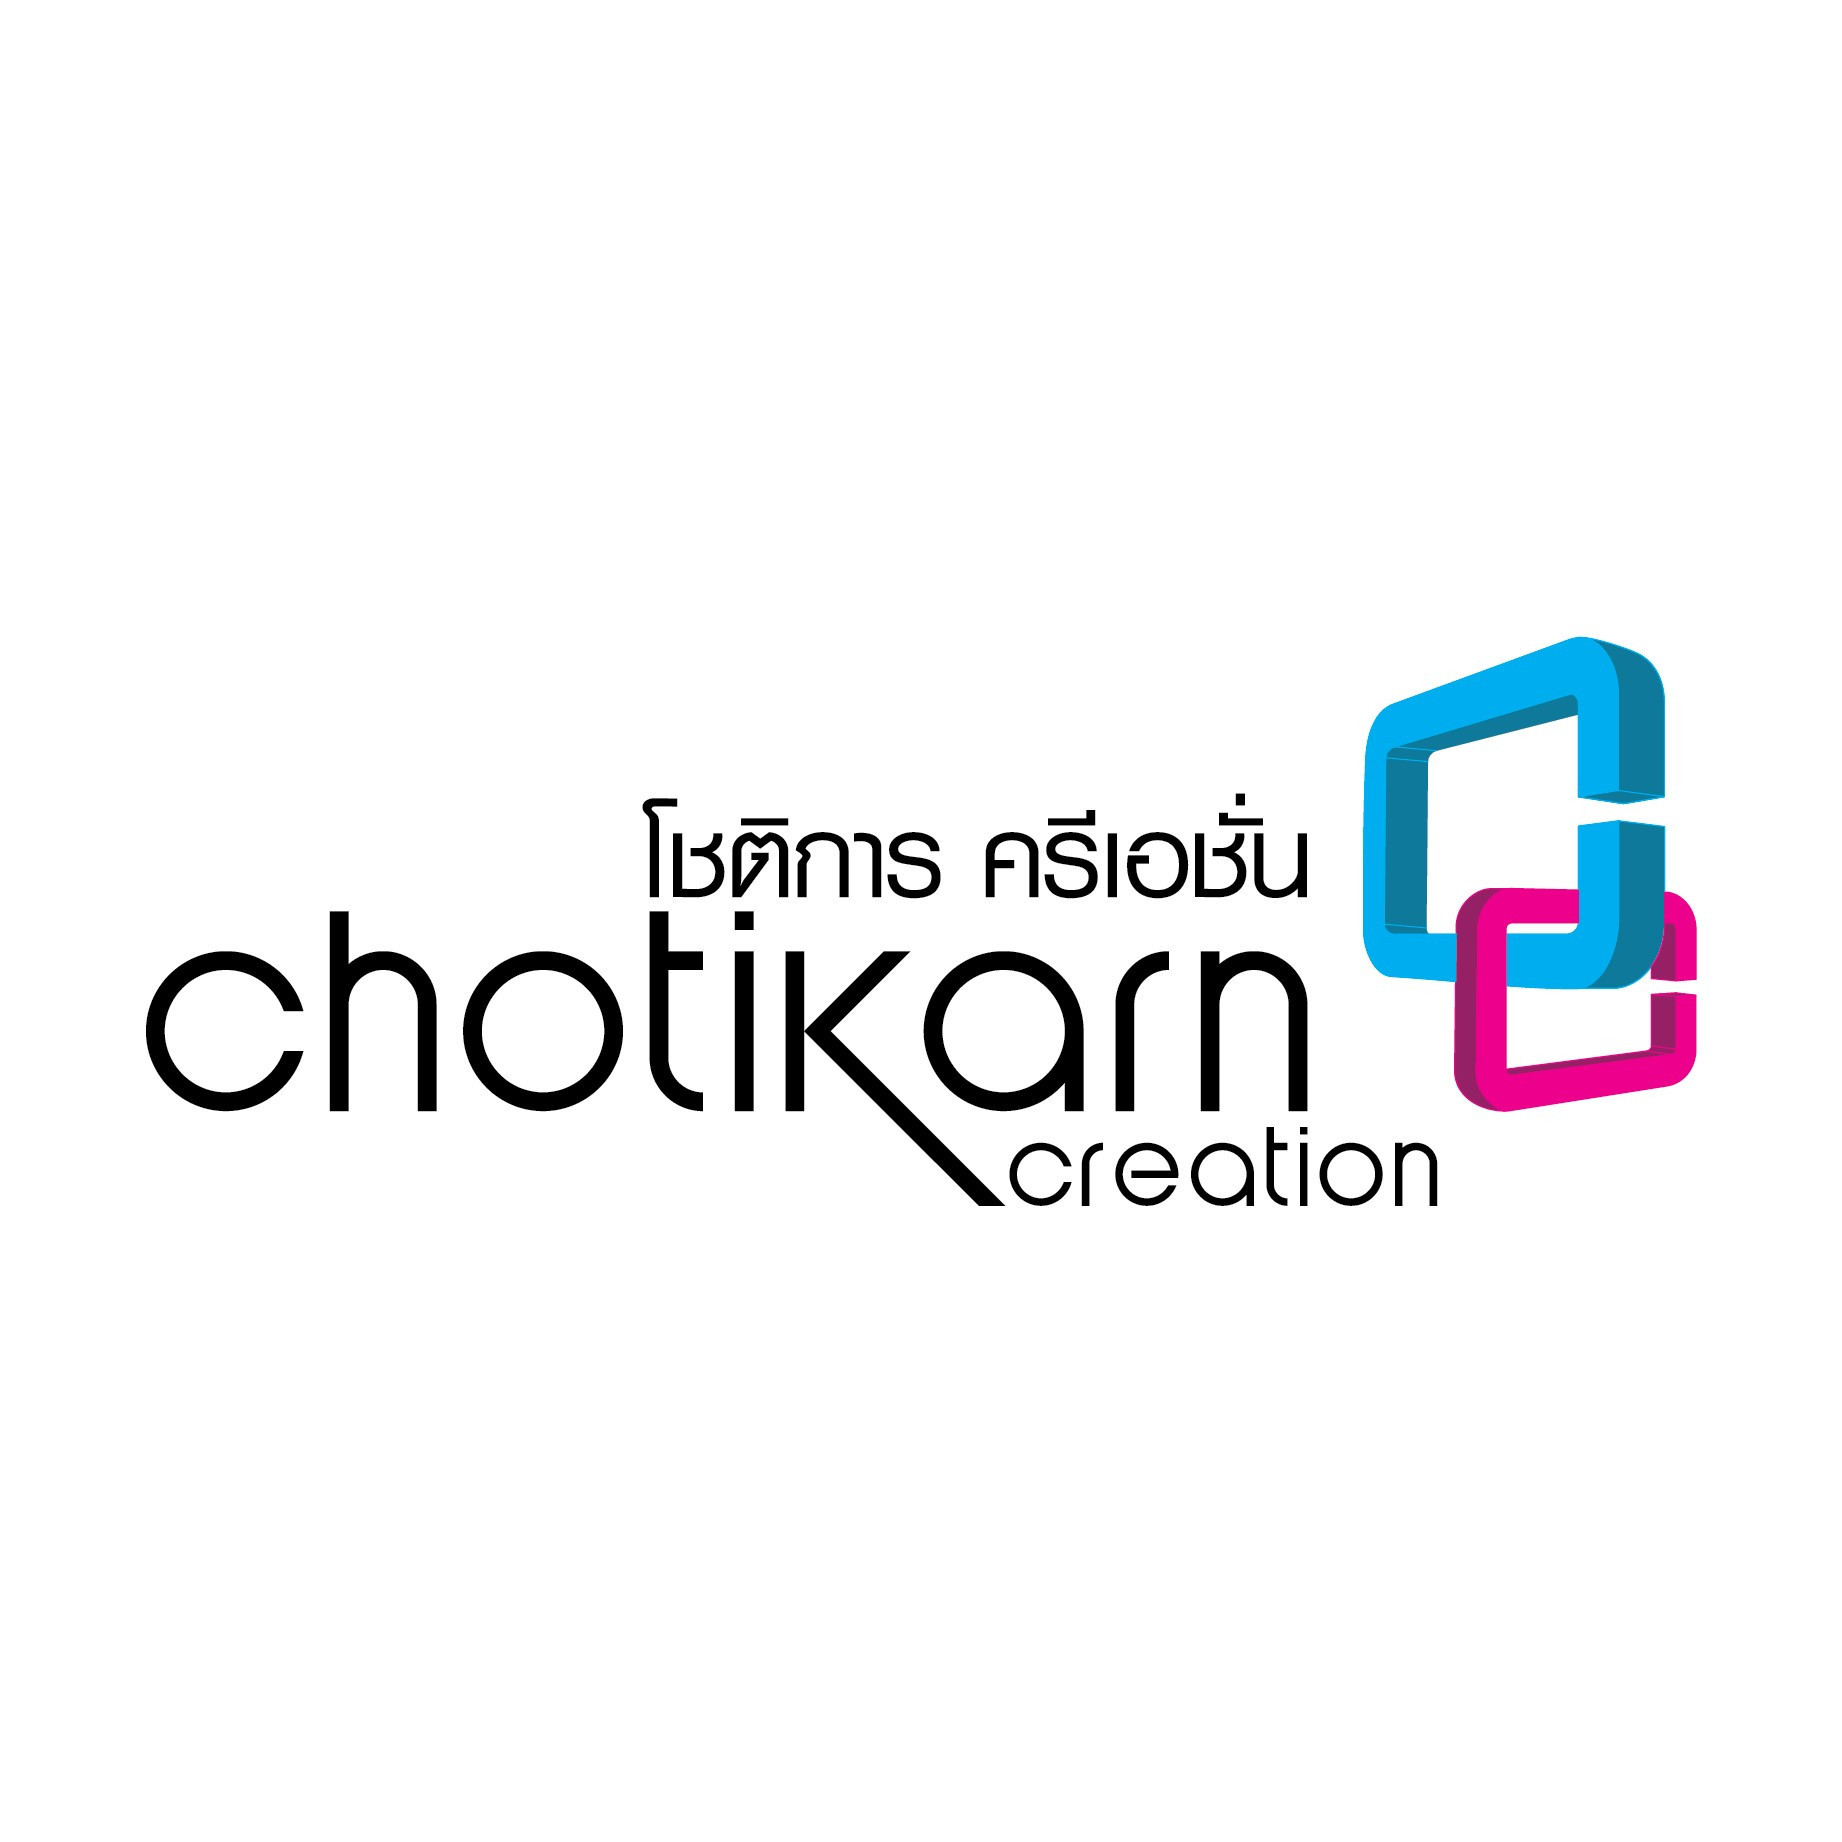 Chotikarn Creation